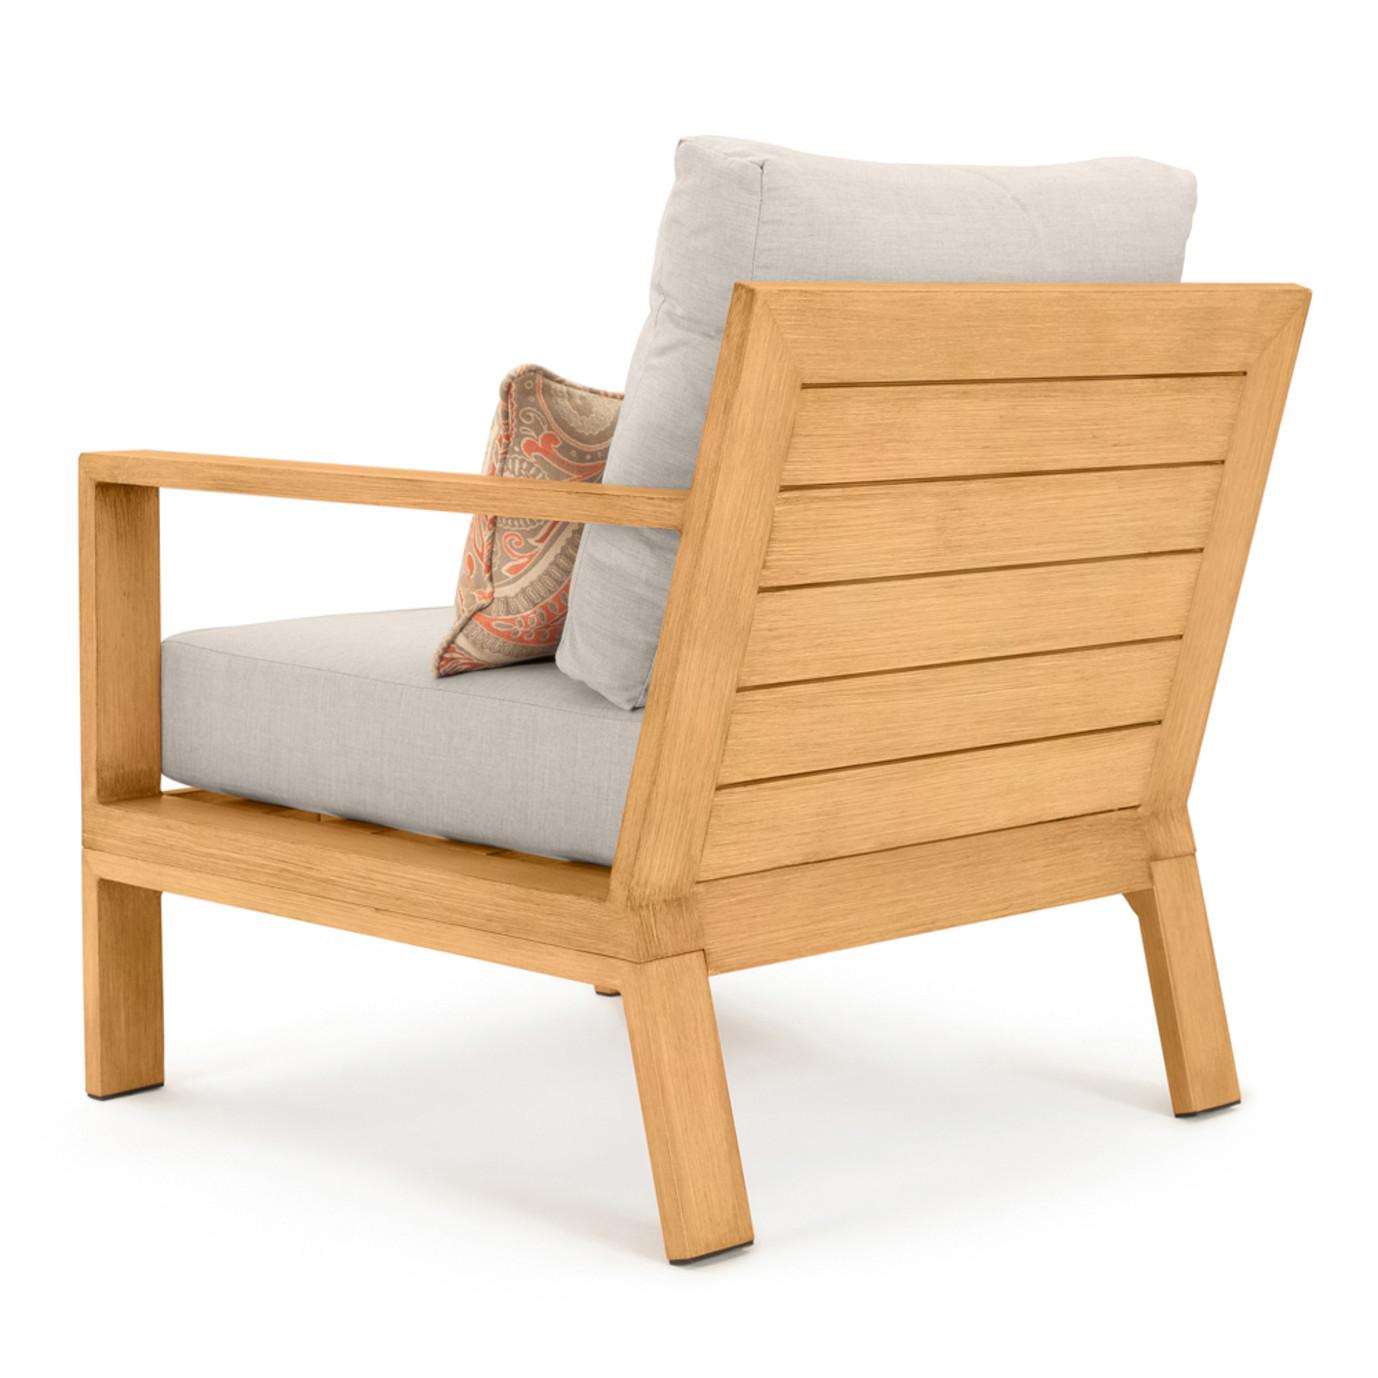 Capri 5 Piece Club Chair & Ottoman Set - Cast Silver